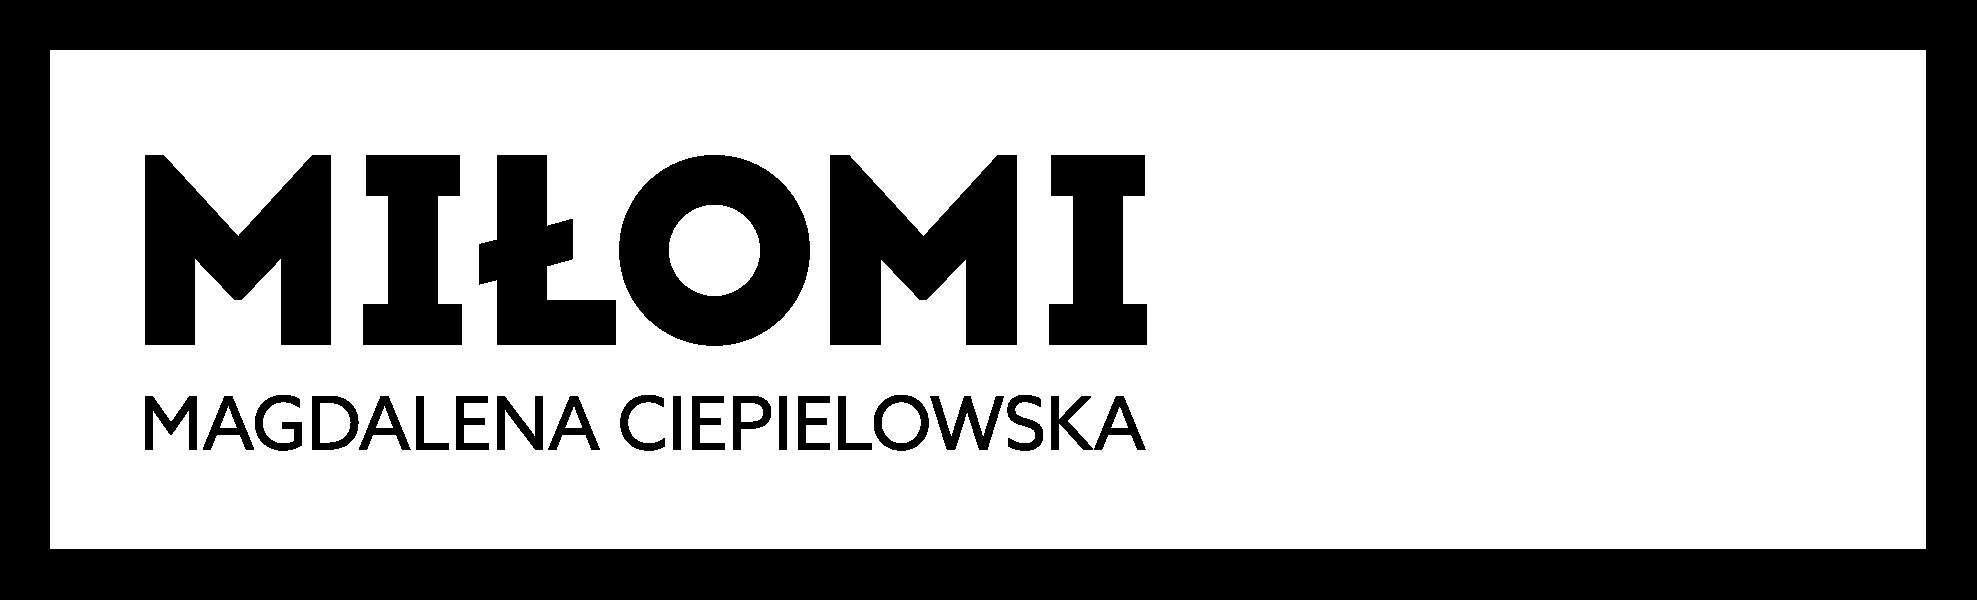 Magdalena Ciepielowska